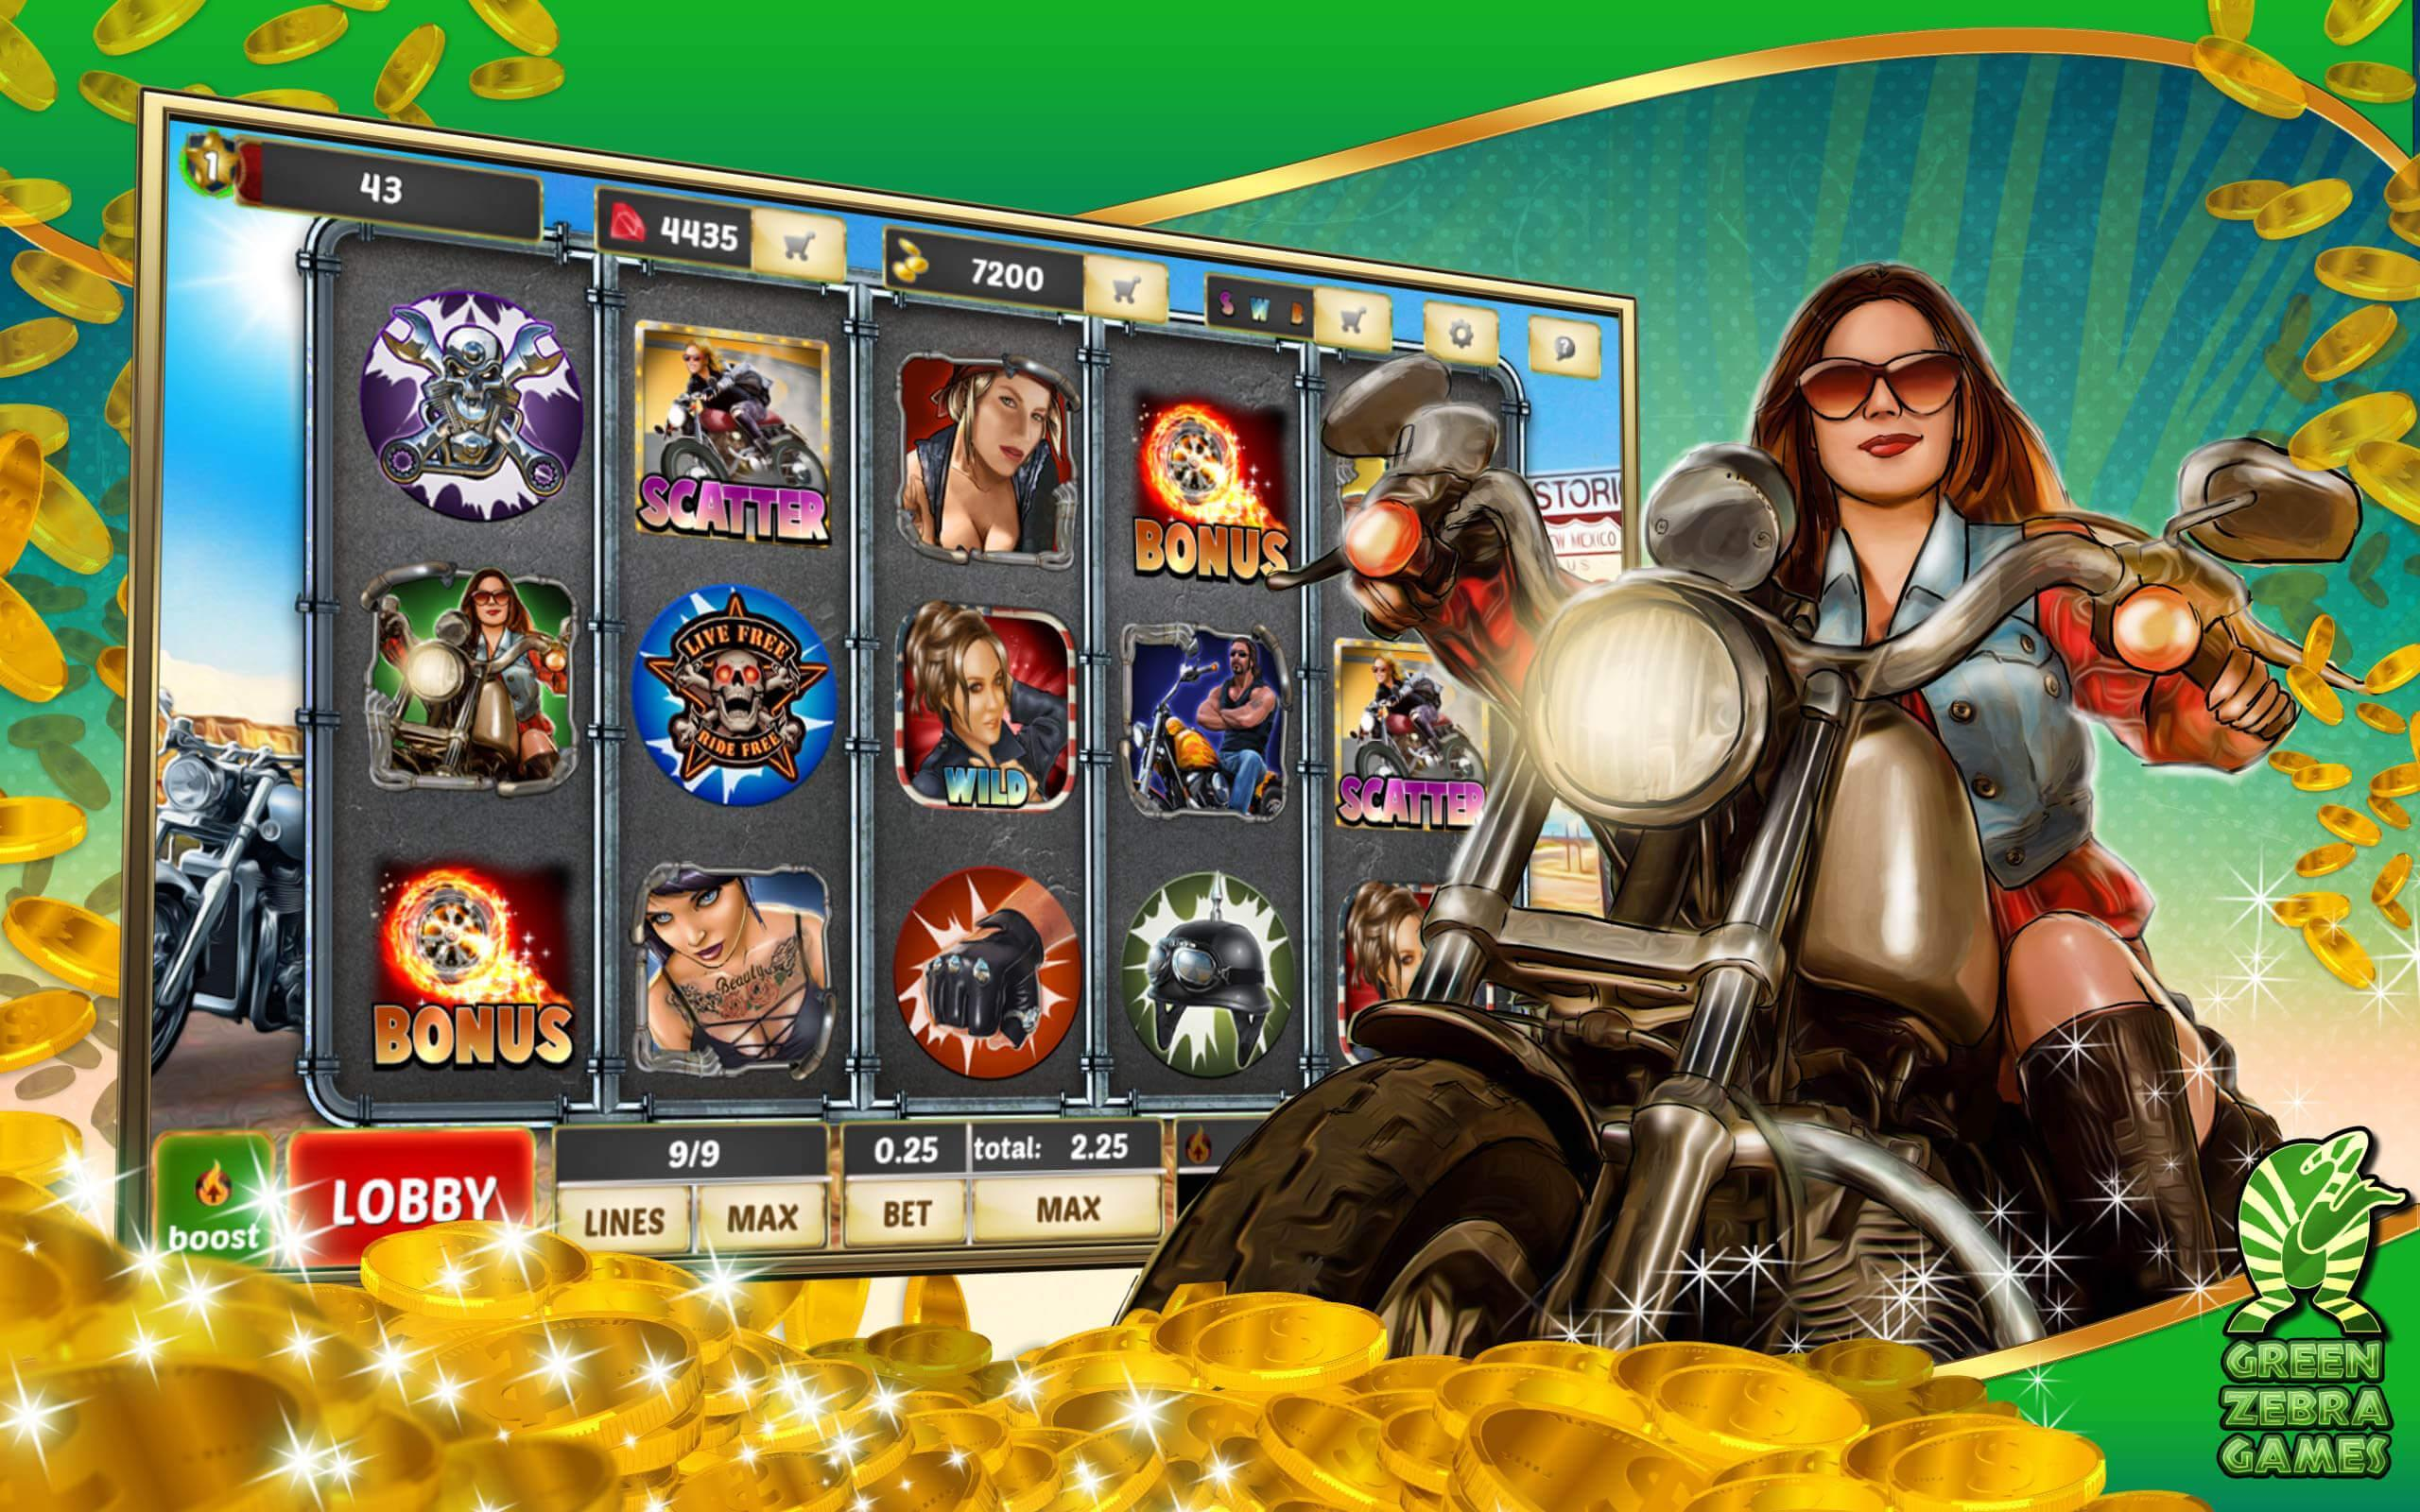 Application bikers gang slot machine online spinomenal tokens]